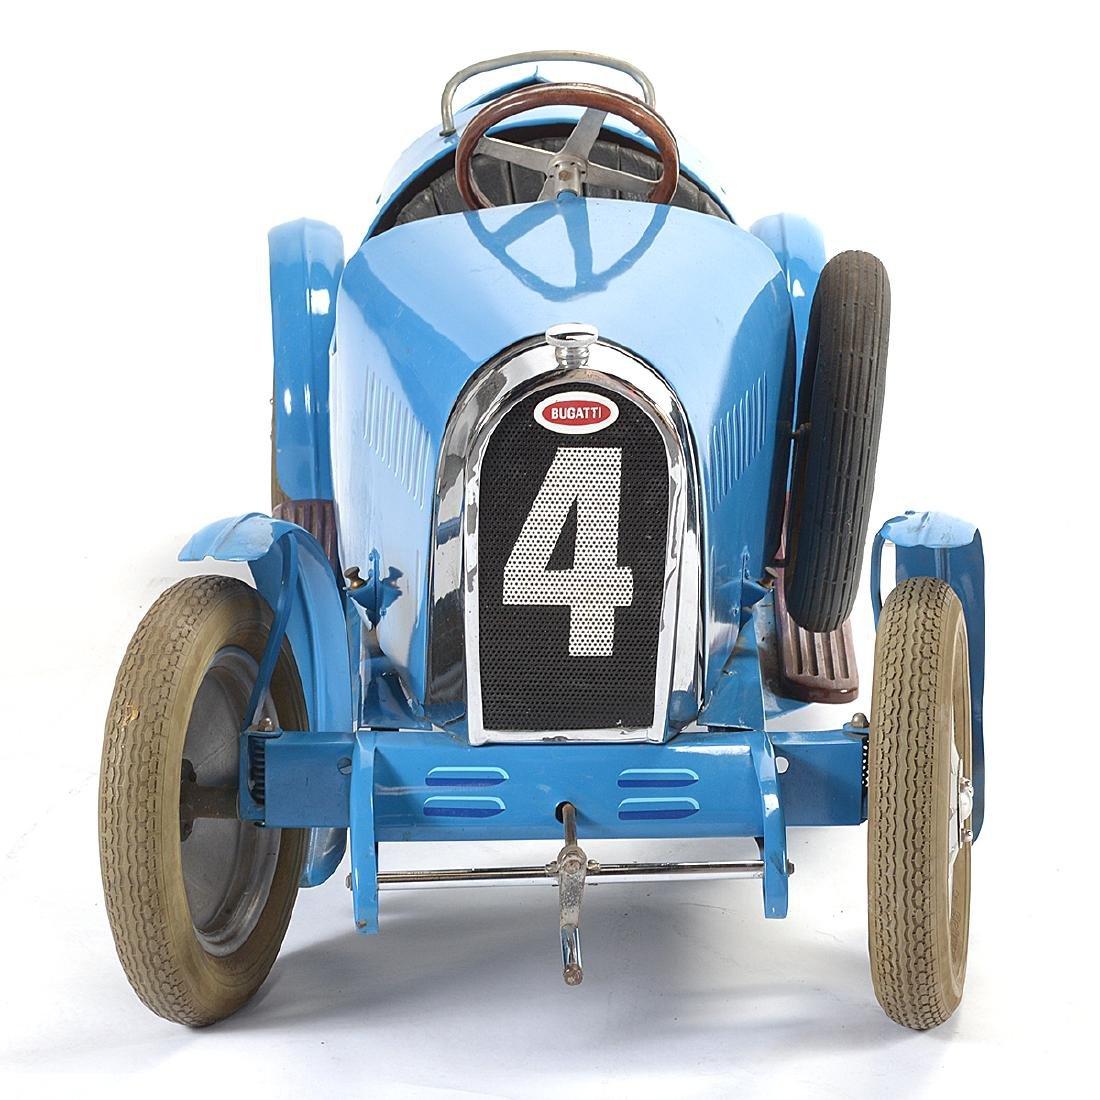 Eureka Bugatti Pedal Car - 6